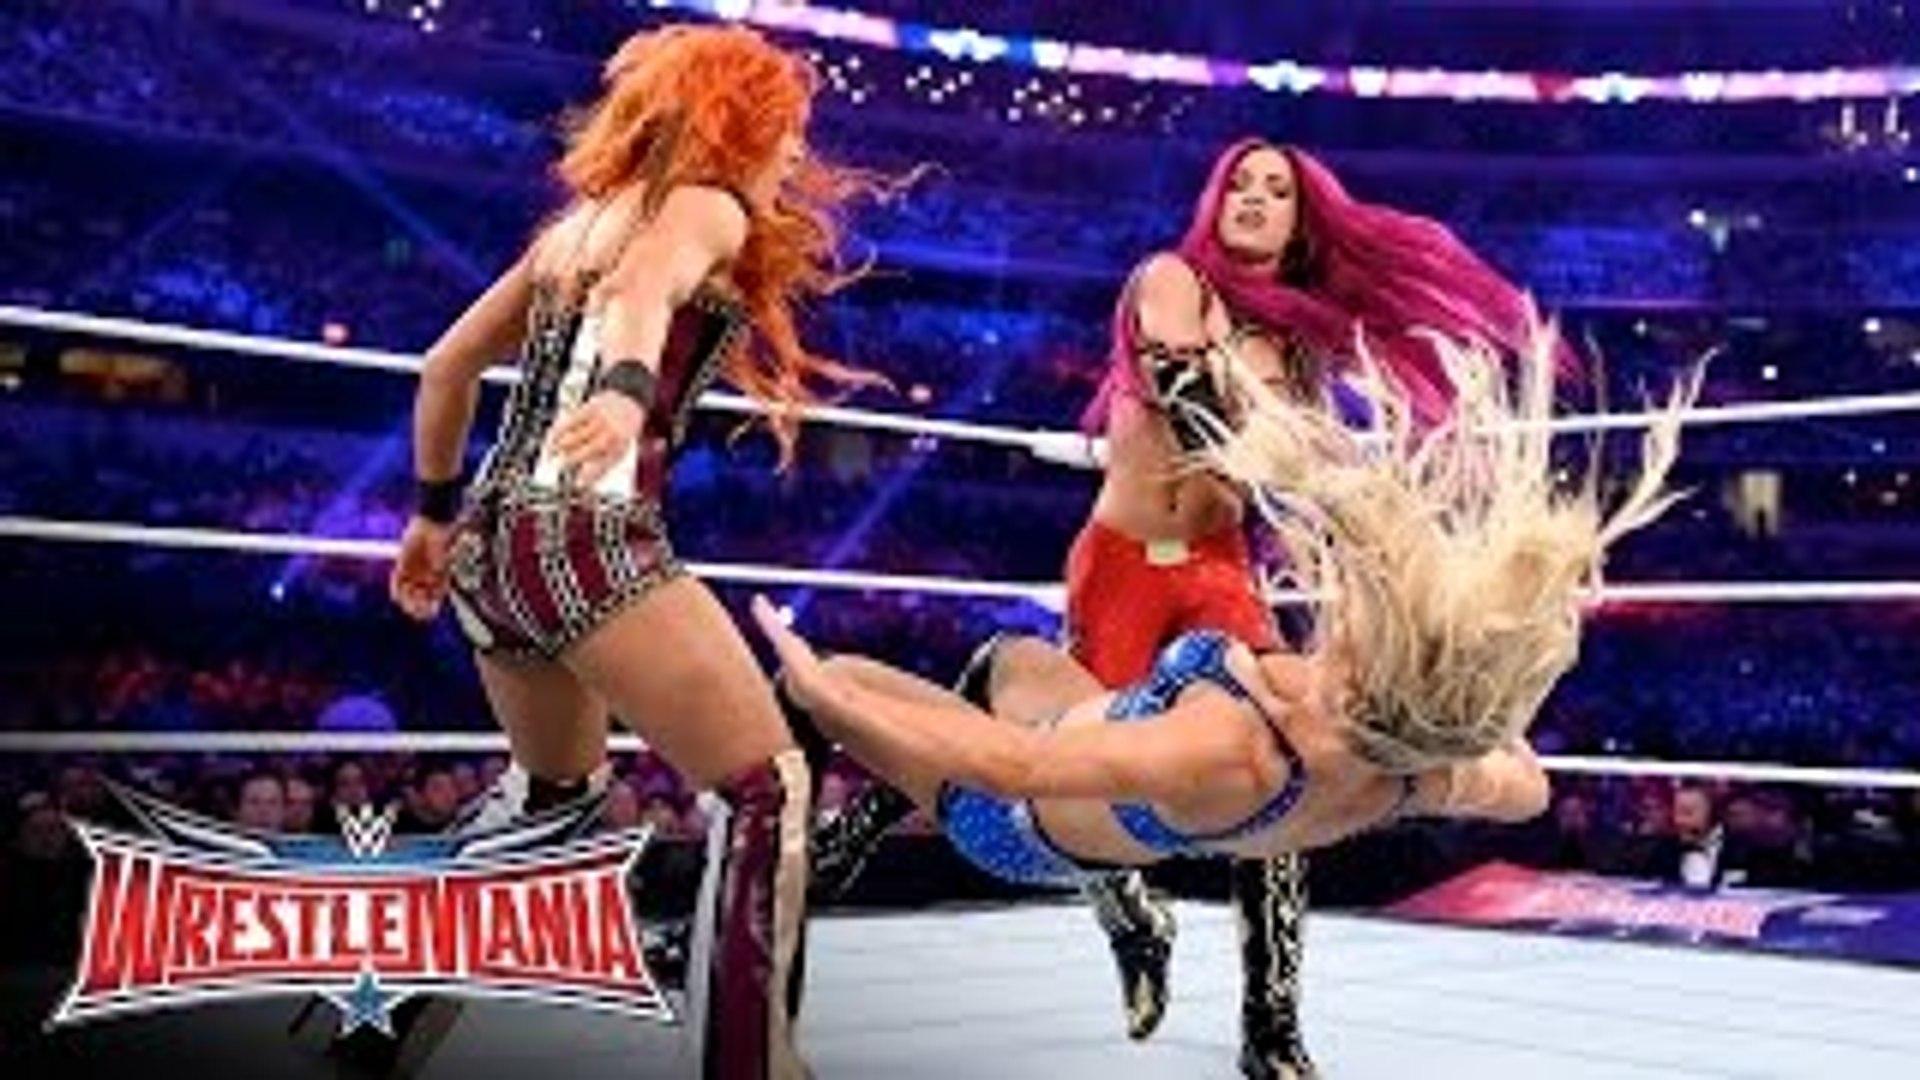 Becky Lynch vs. Sasha Banks vs. Charlotte - WWE Women's Title Match- WrestleMania 32 on WWE Net